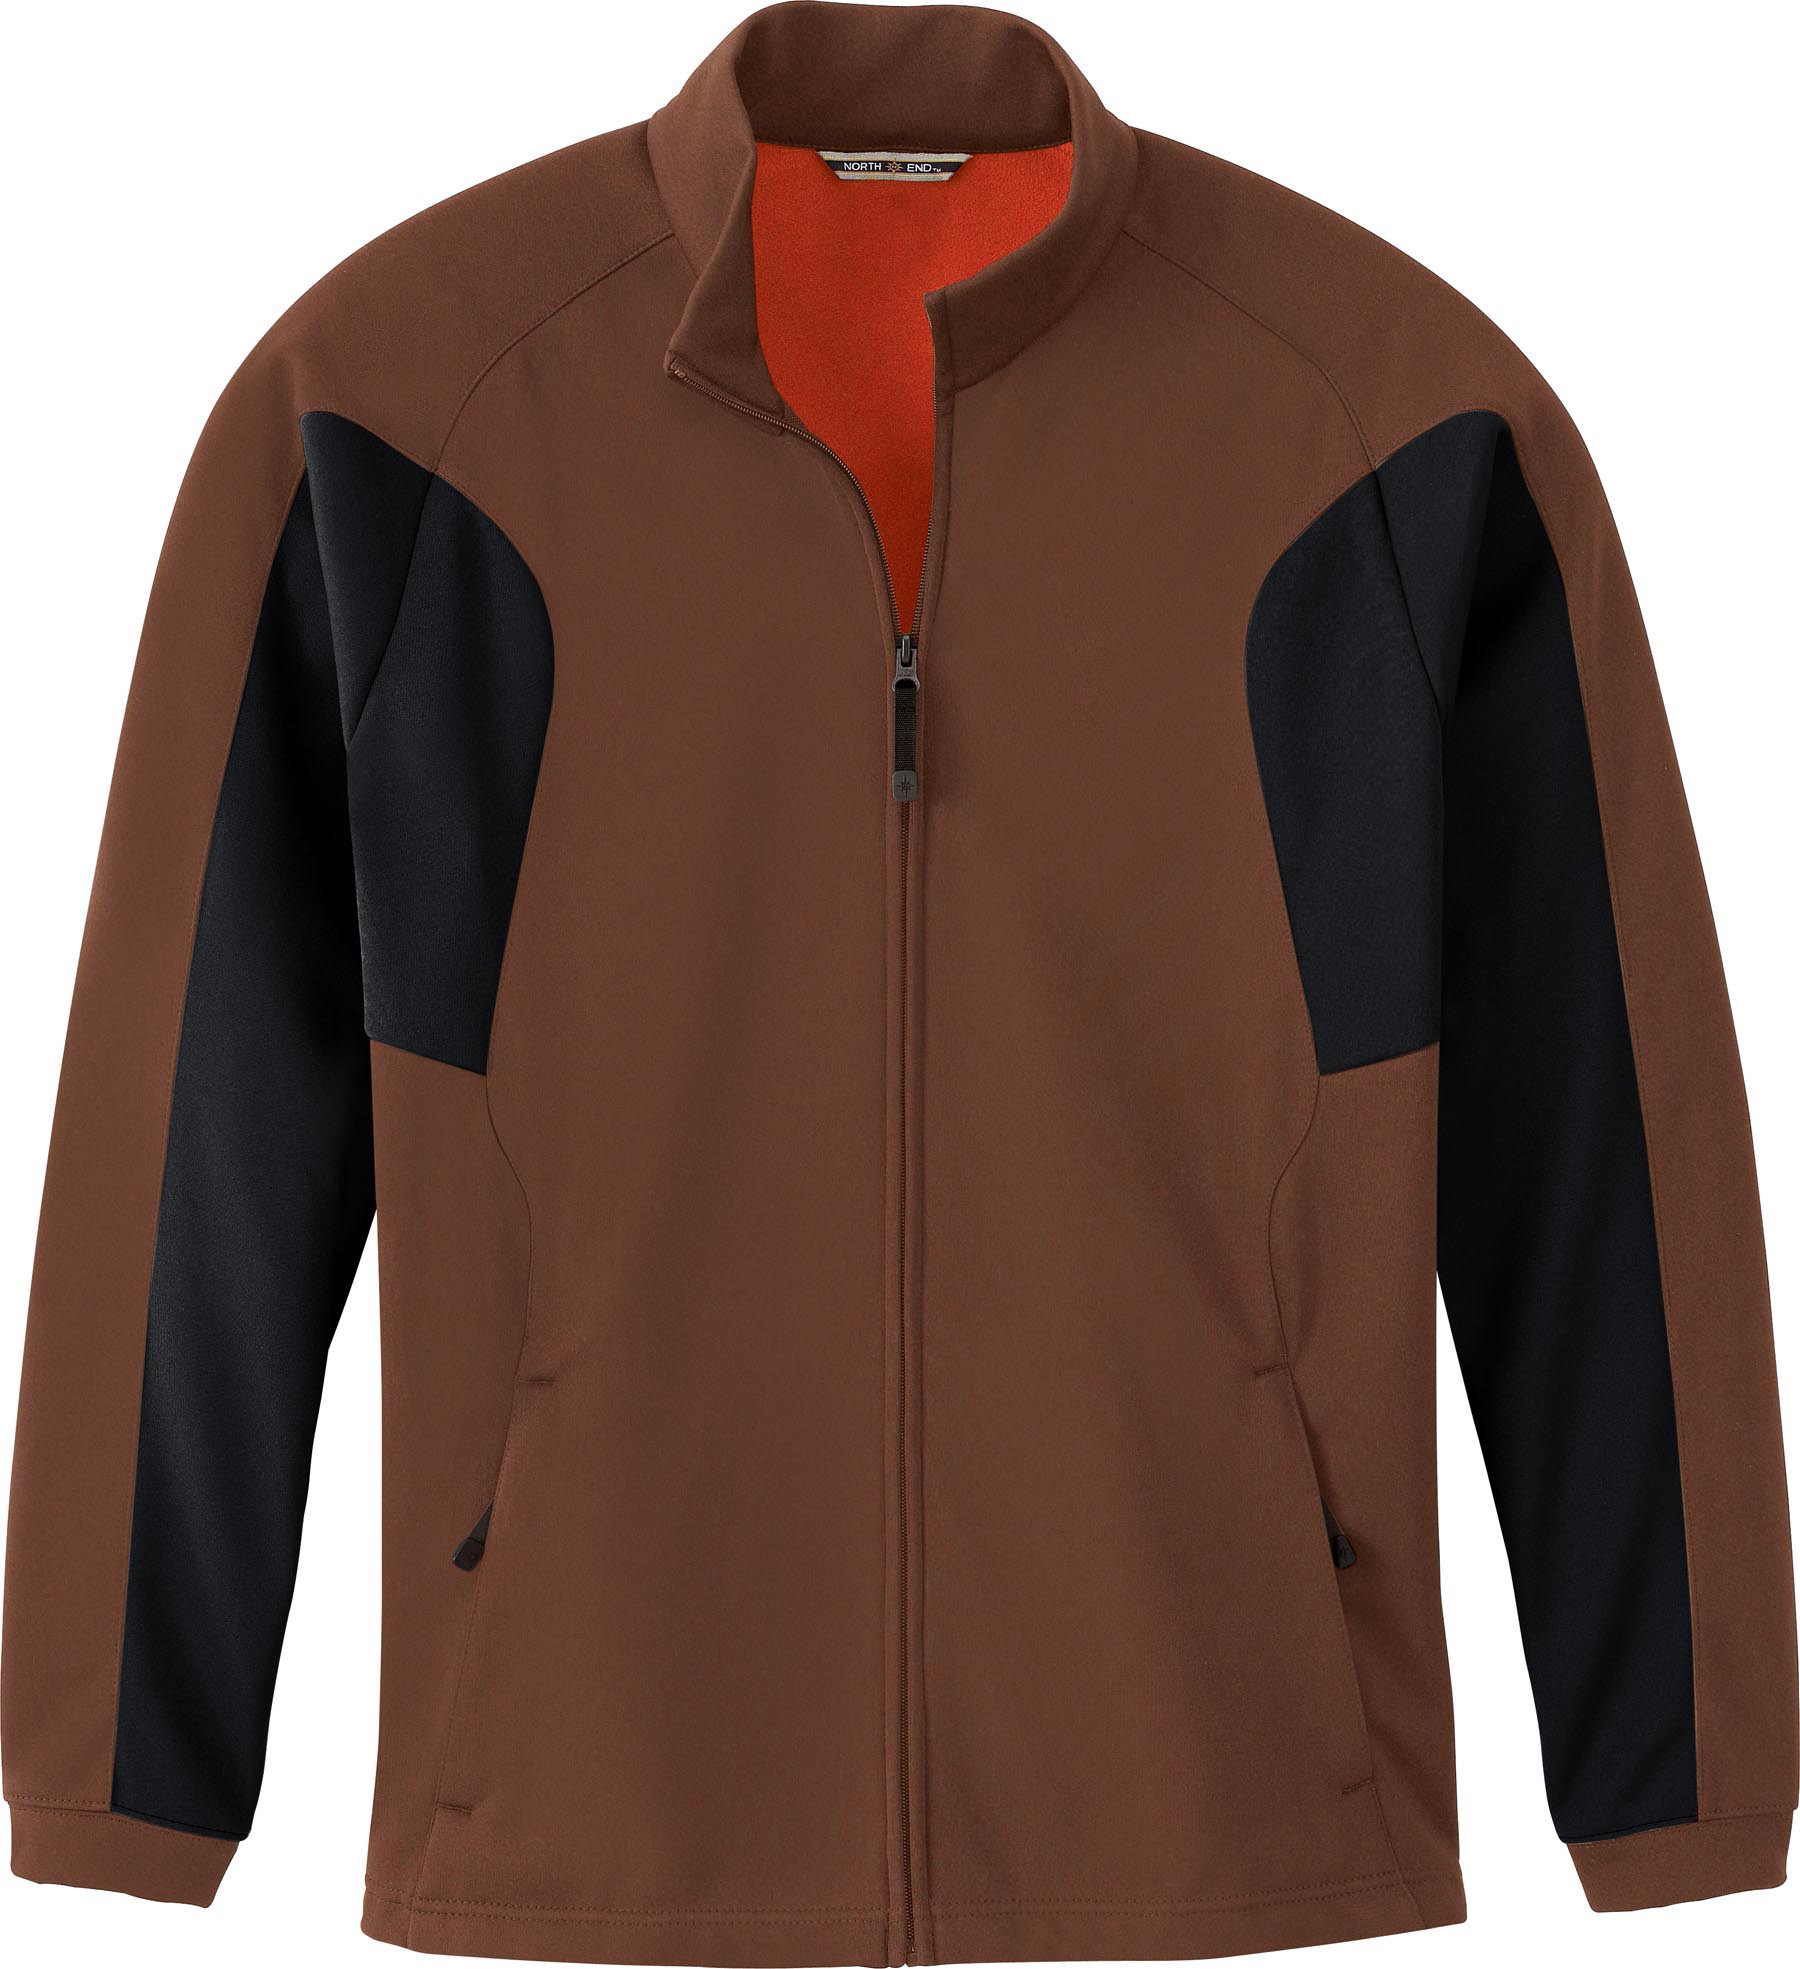 Ash City Bonded Fleece 88151 - Men's Bonded Fleece Jacket